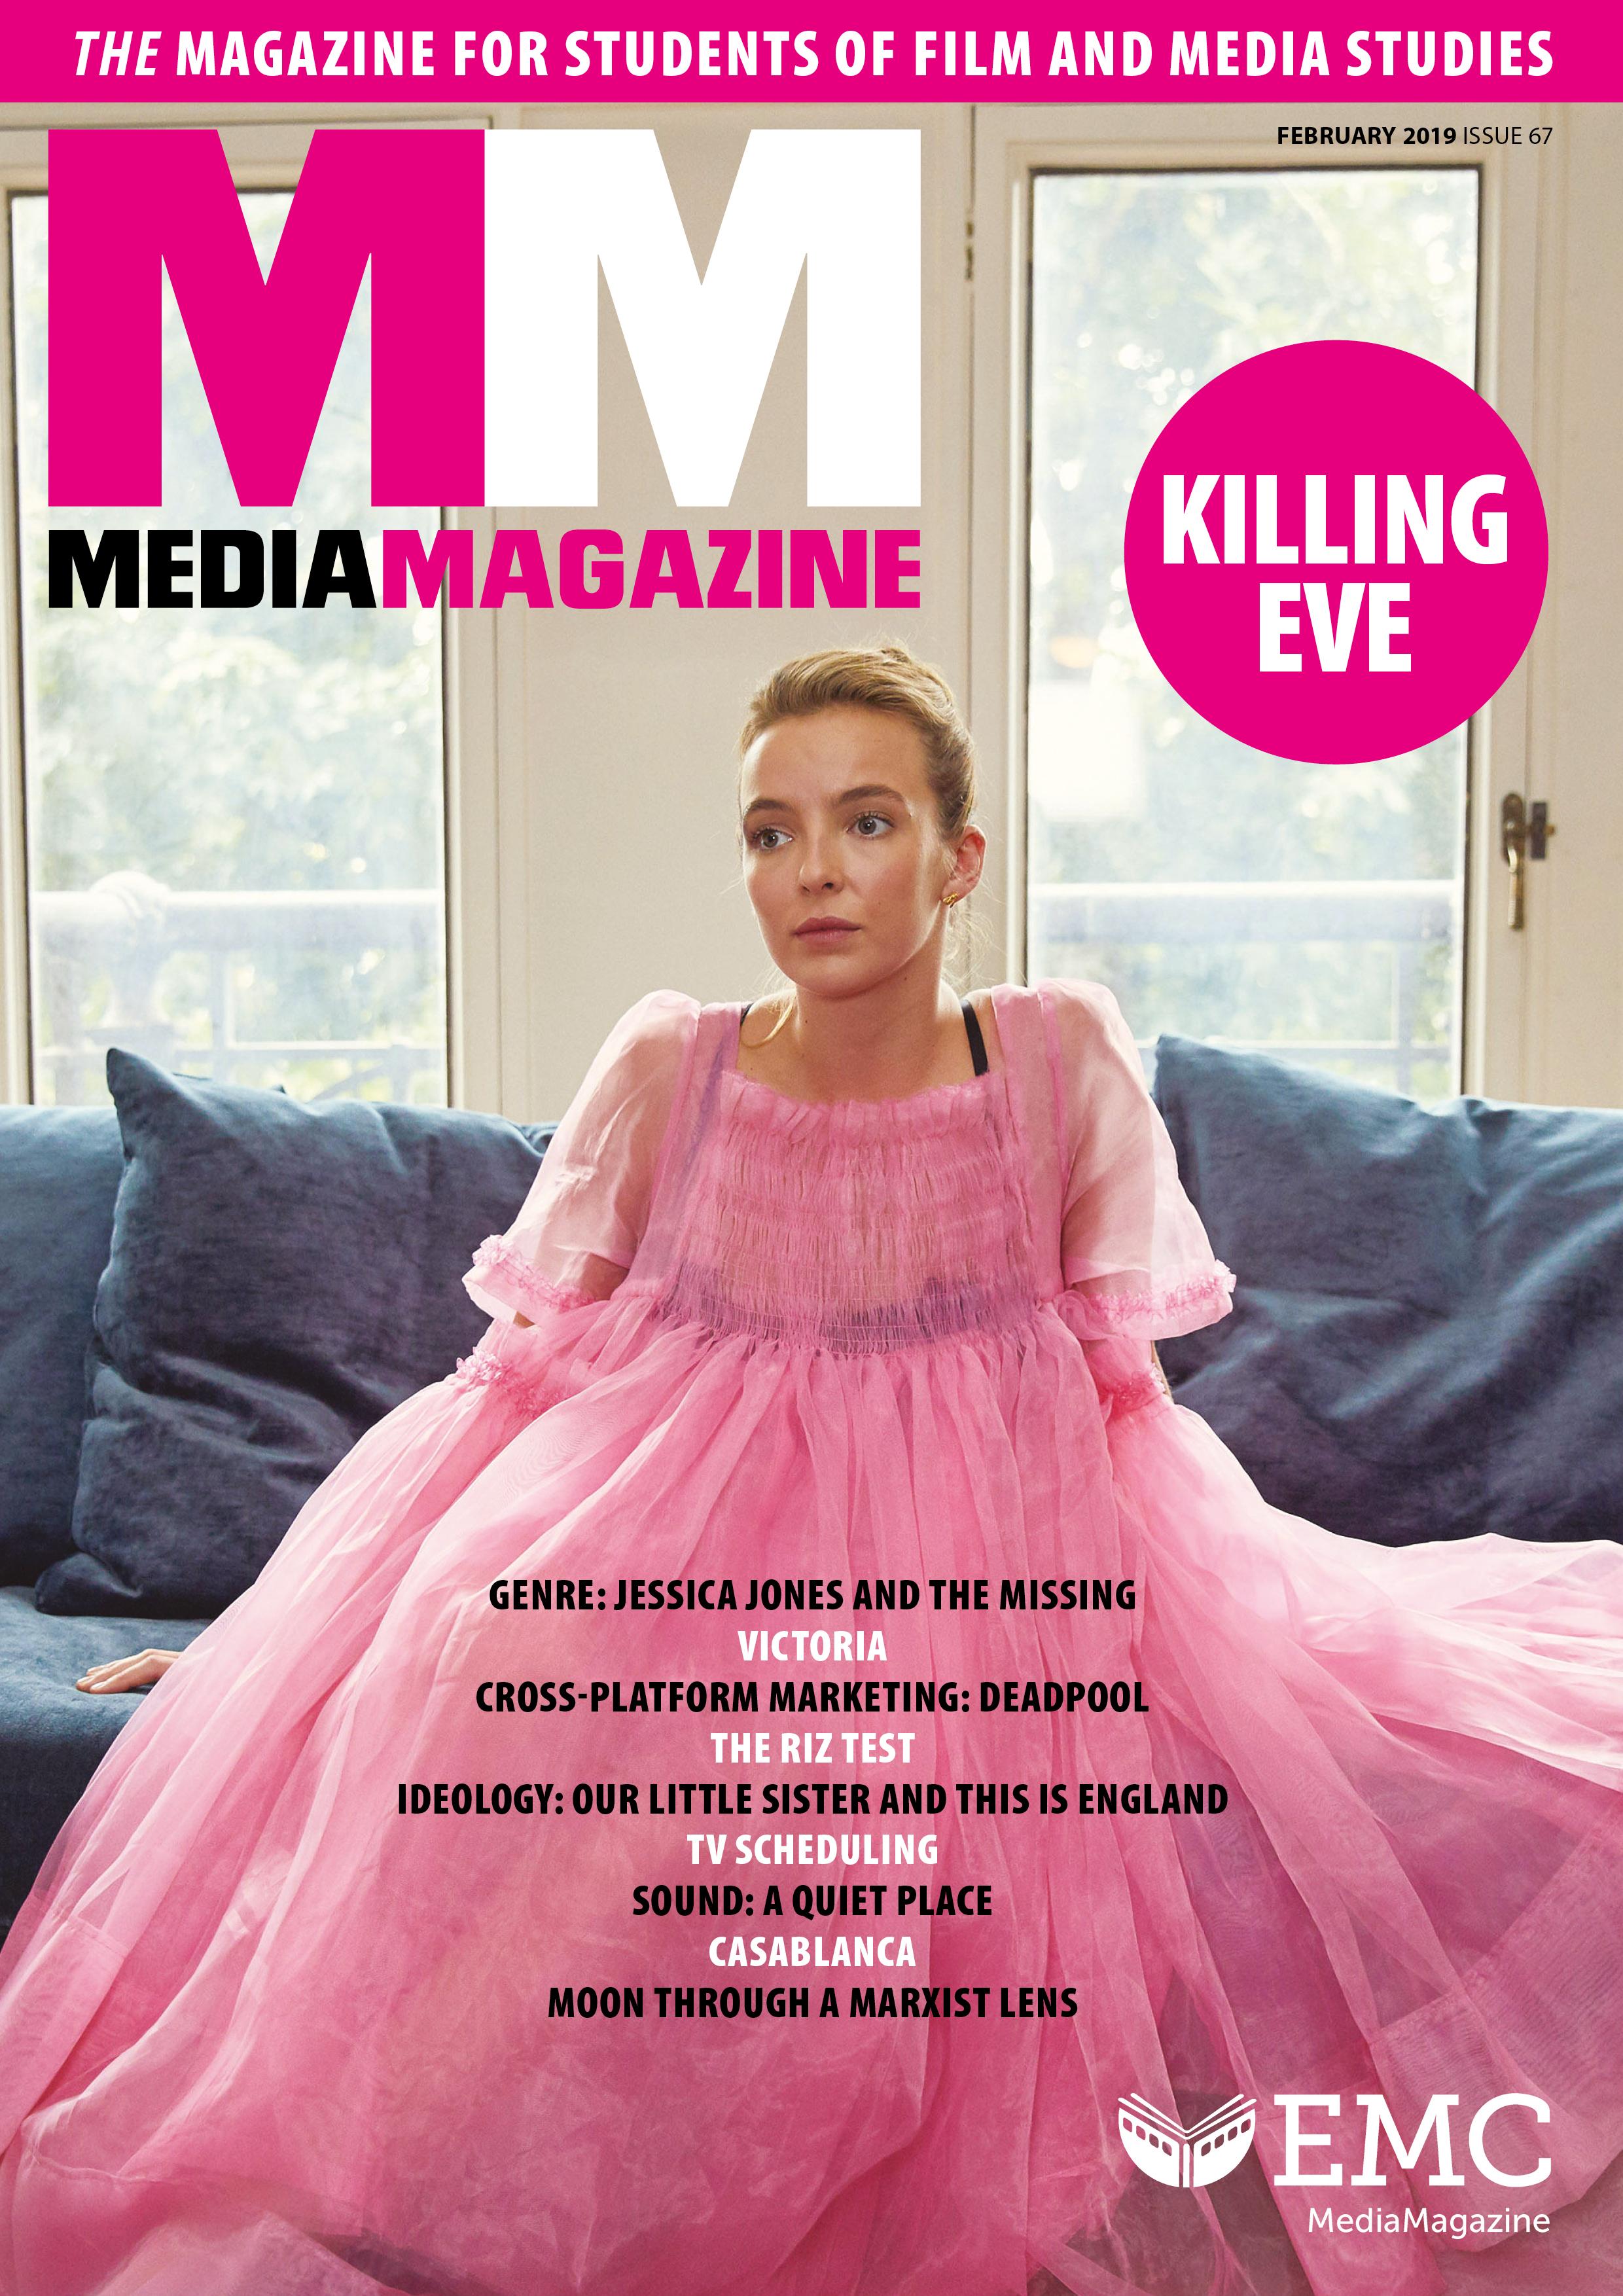 MediaMagazine 67 front cover